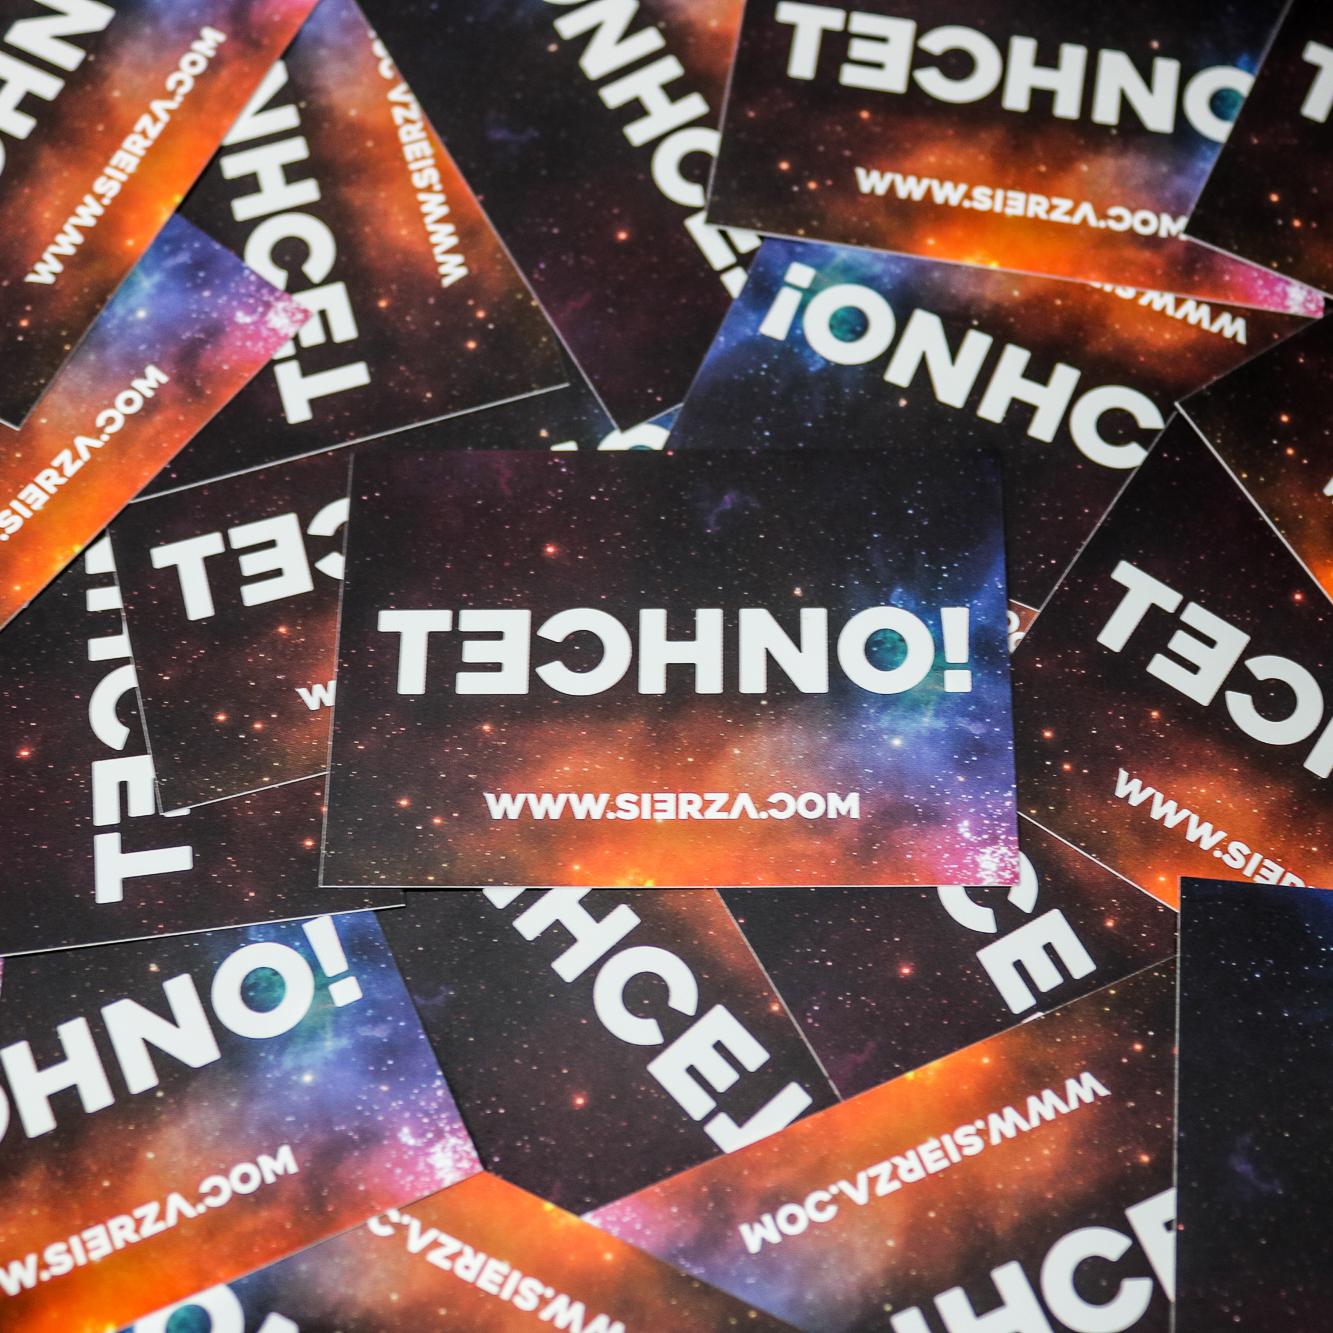 Sierza Techno T-Shirt ® sticker tech